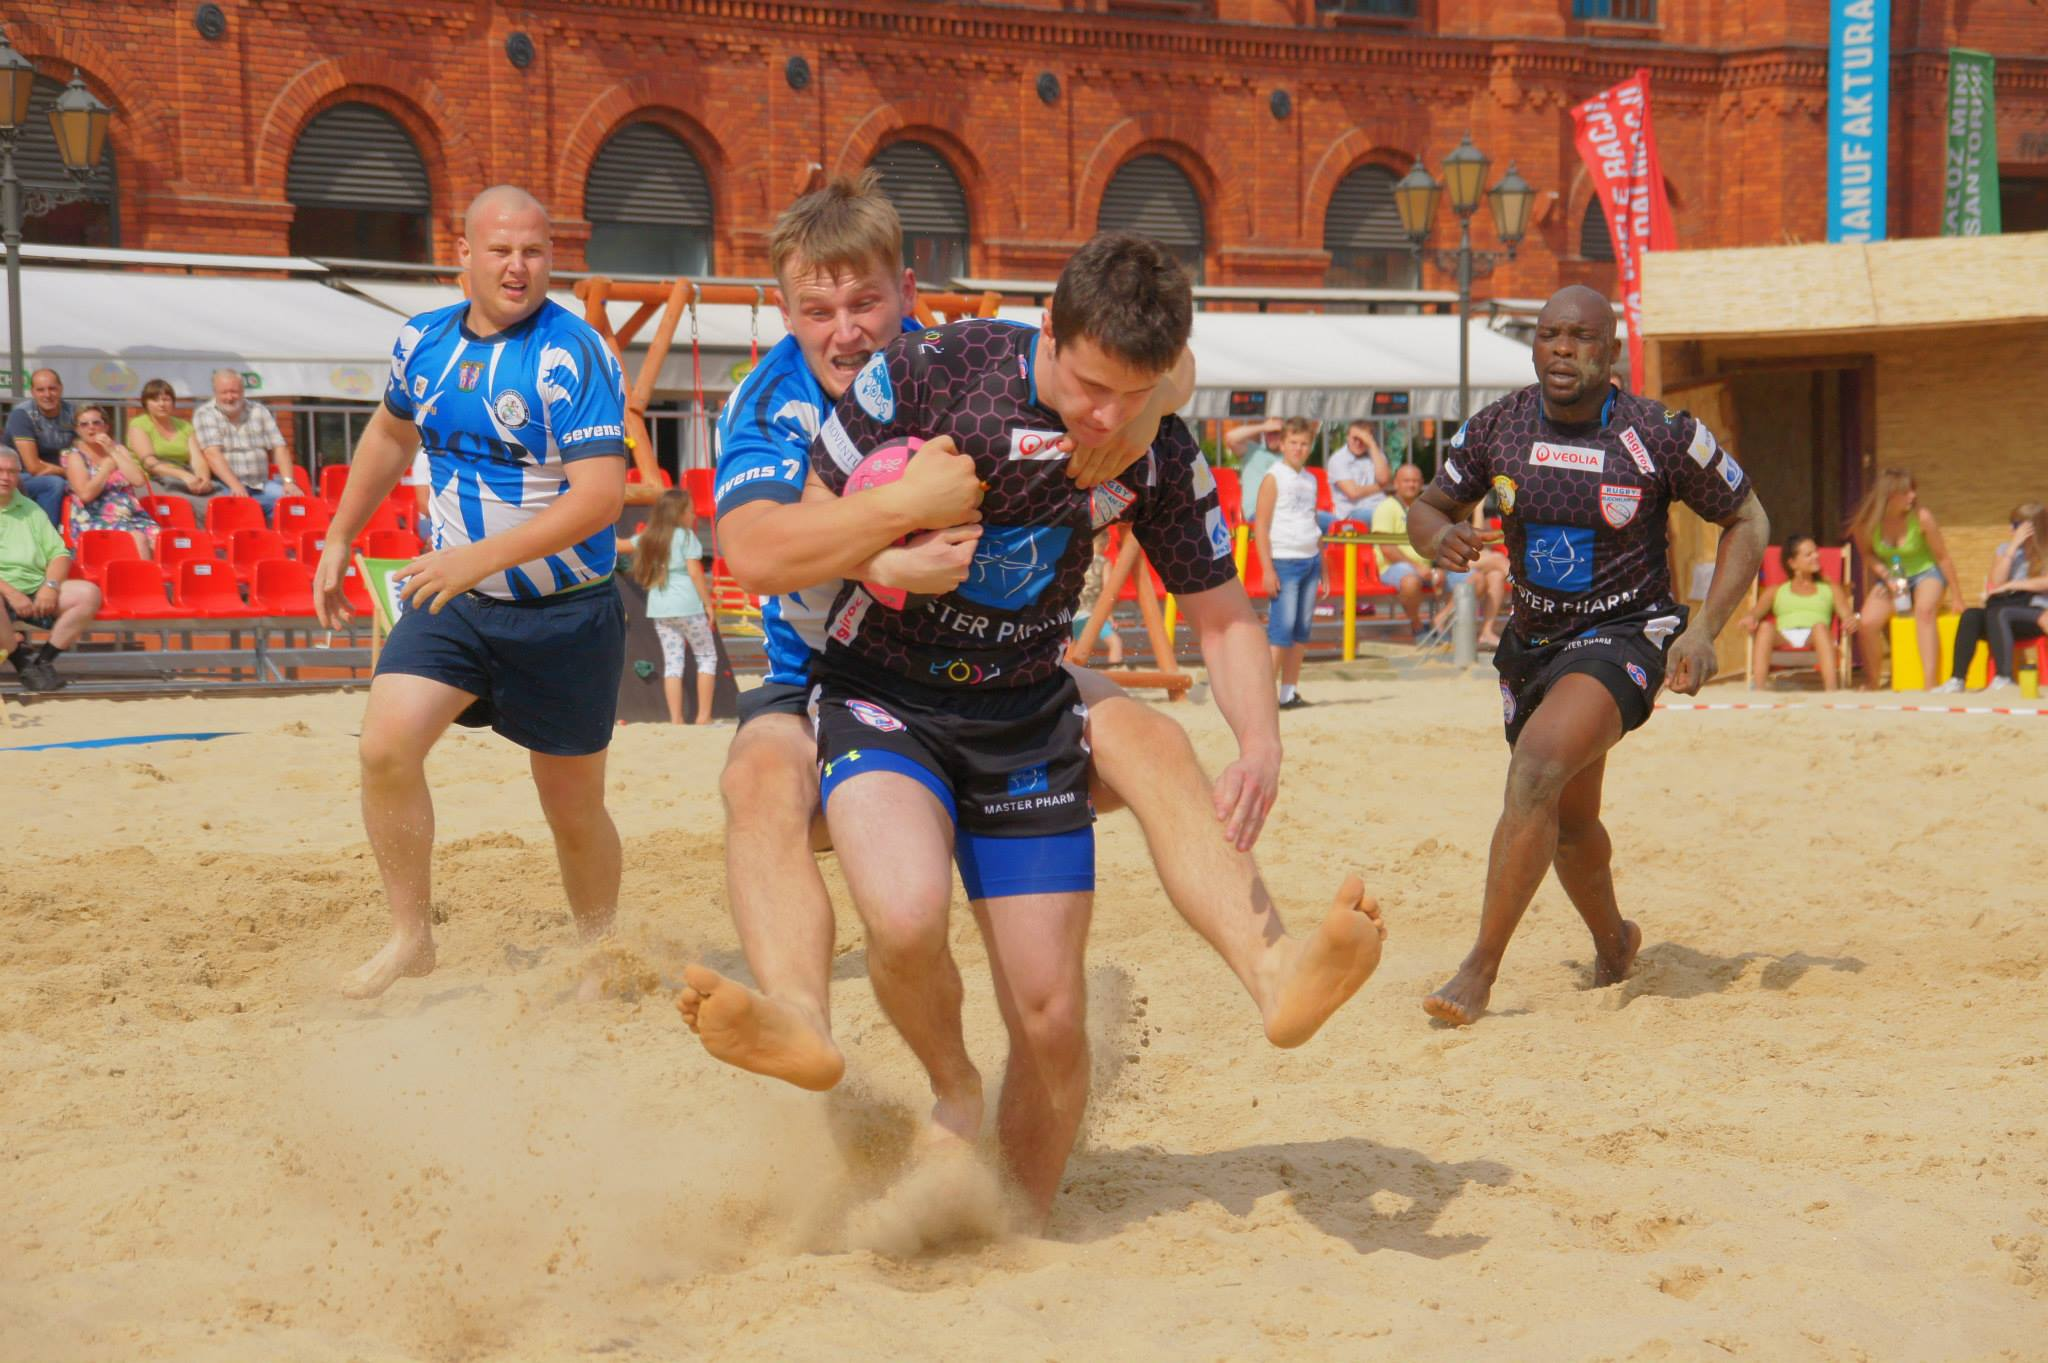 Rugby_plazowe_foto